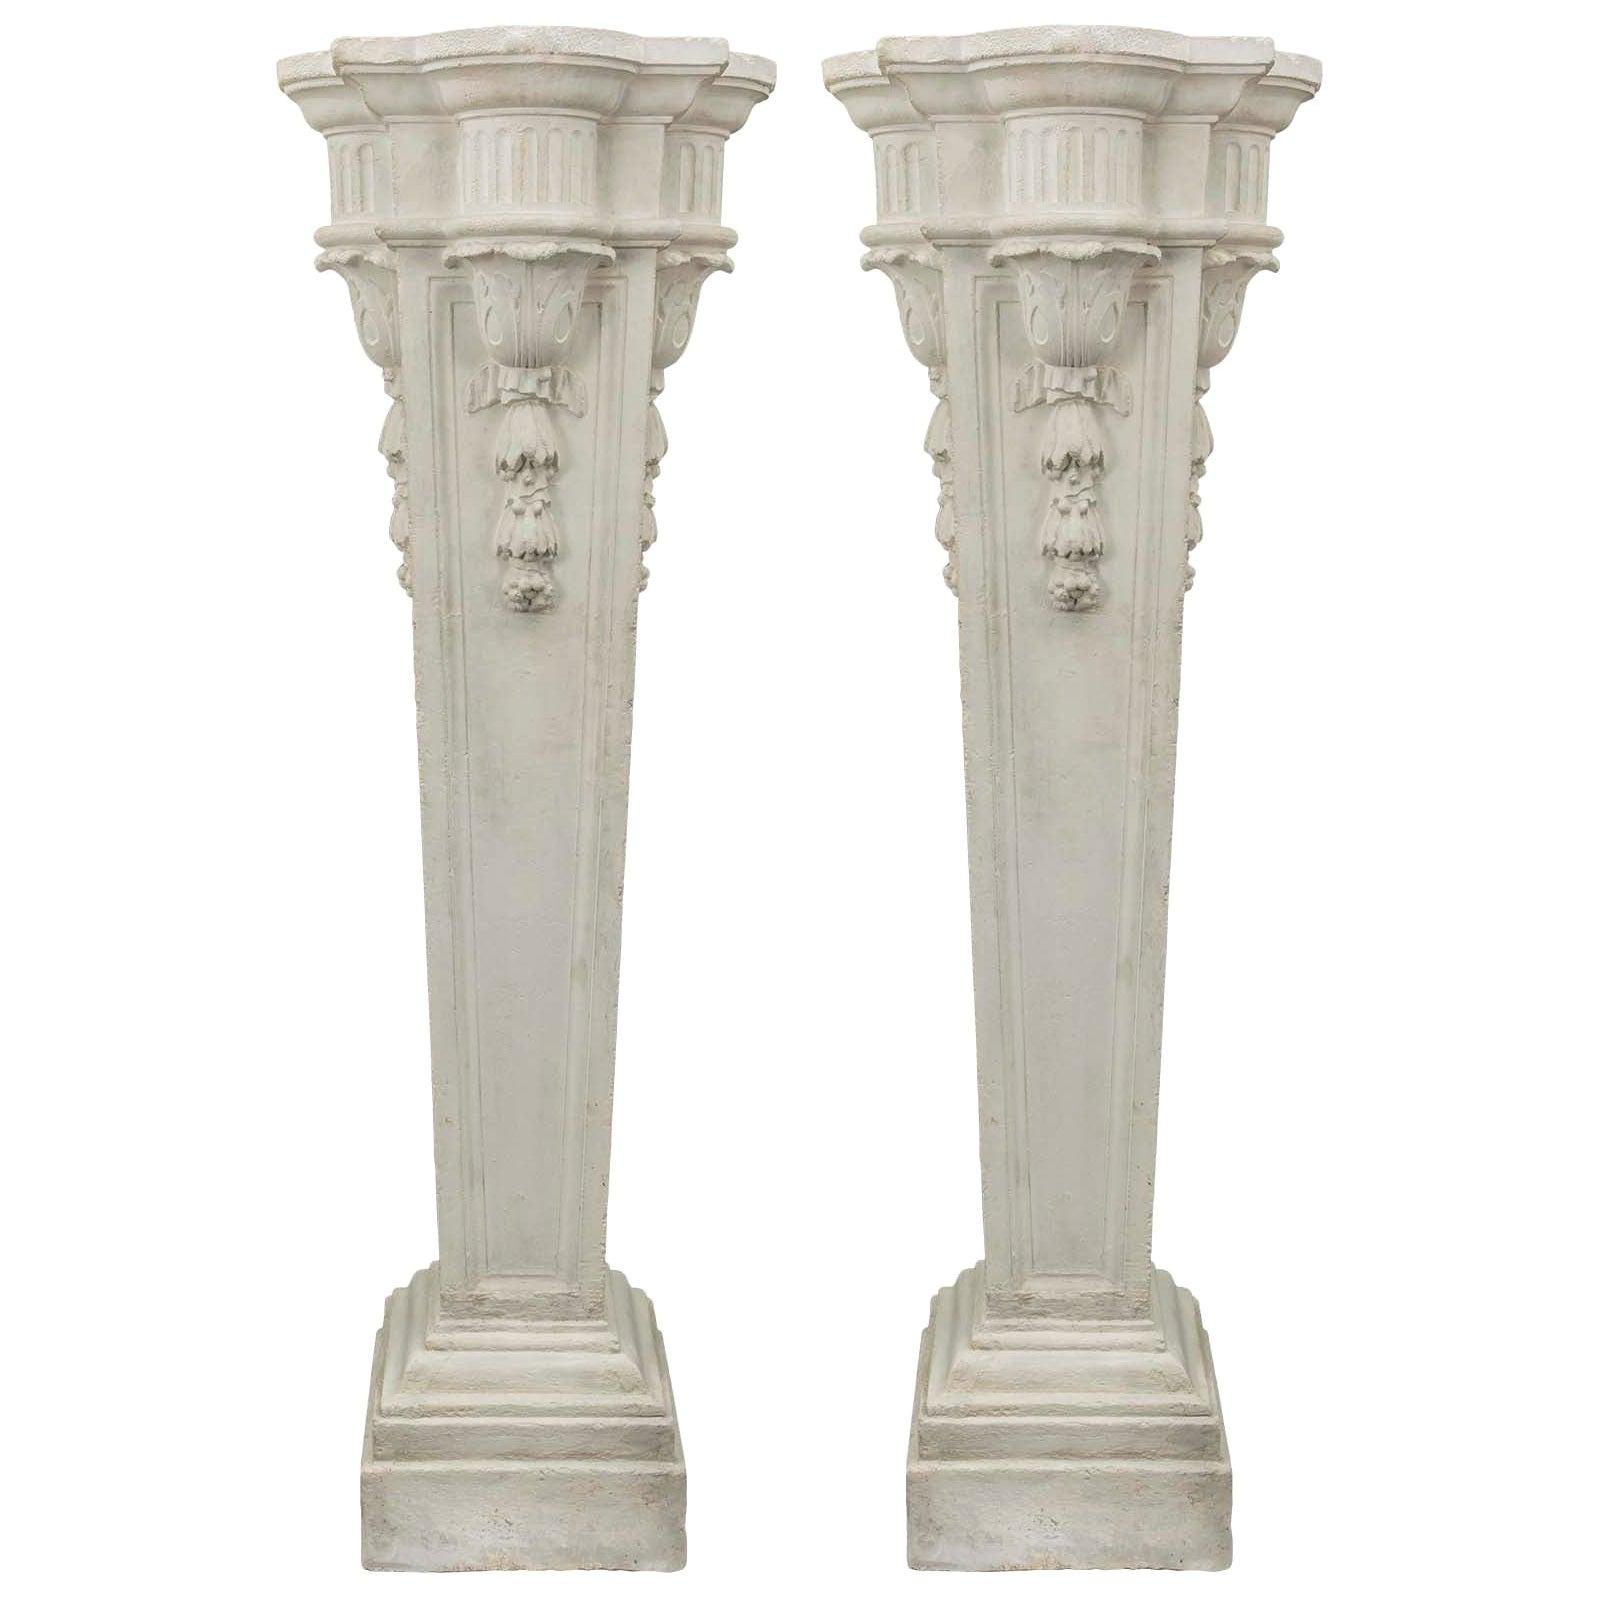 French 19th Century Louis XVI Style Plaster Pedestals